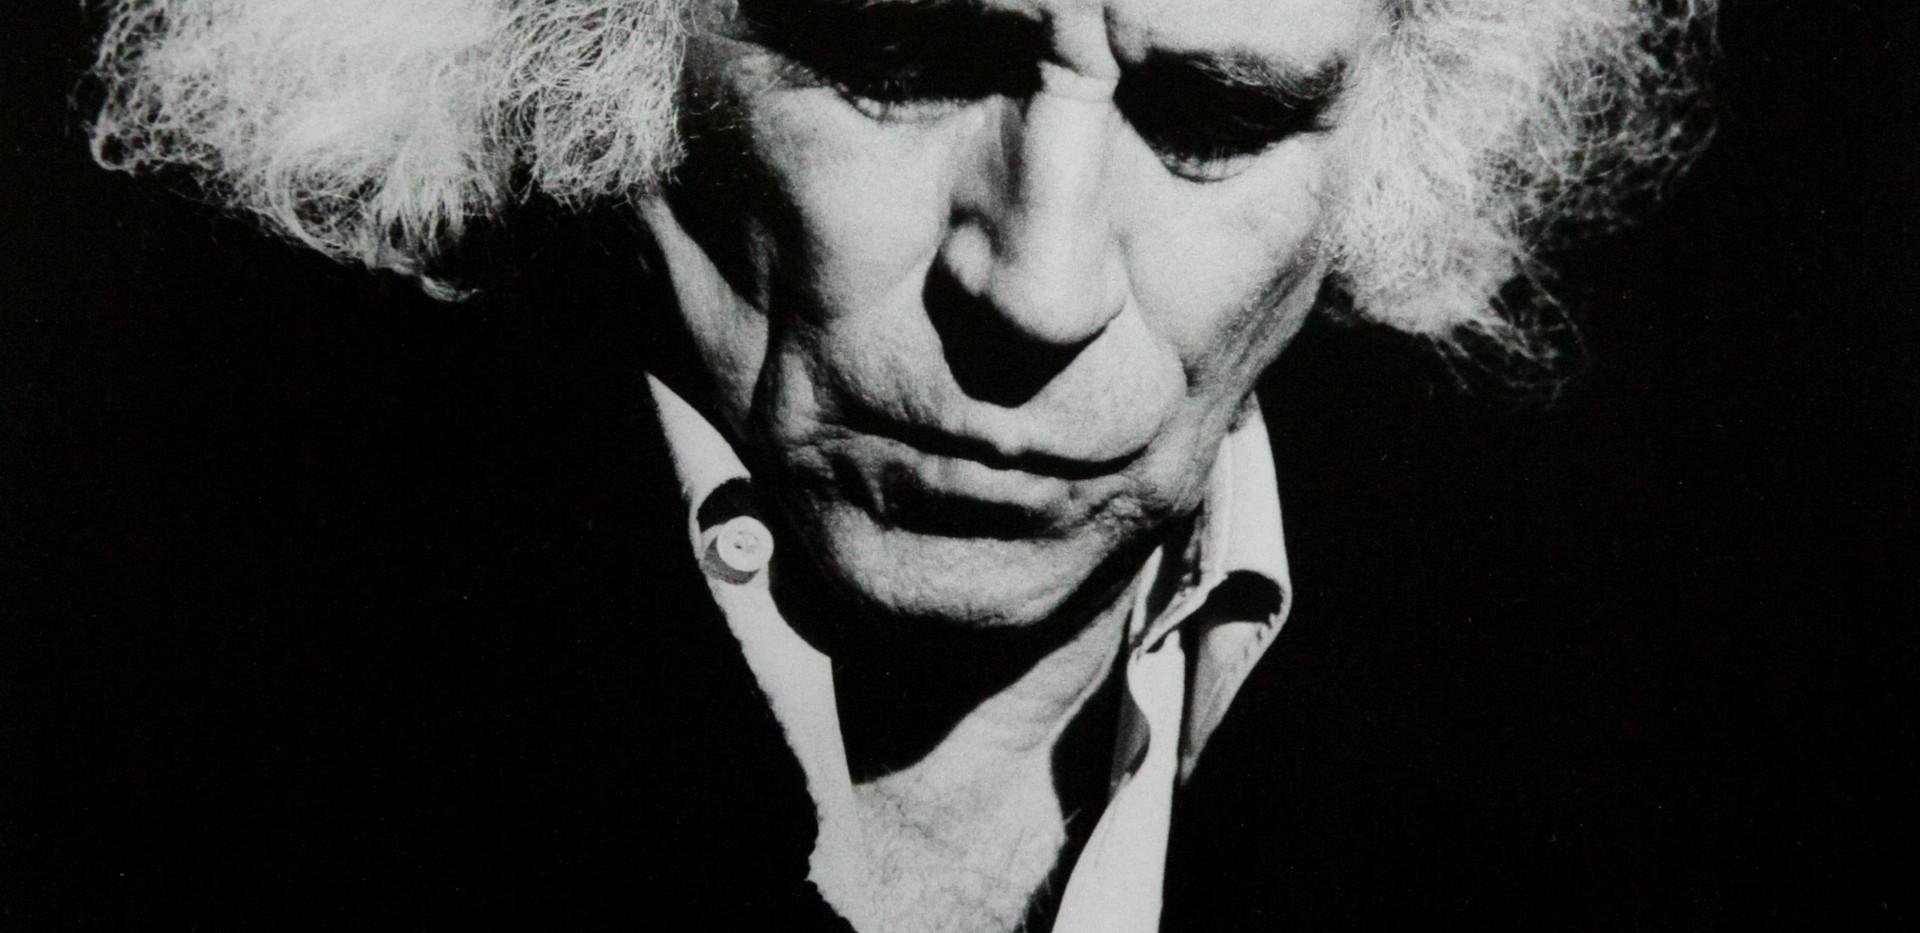 Michel Giniès Leo Ferré 1984.JPG